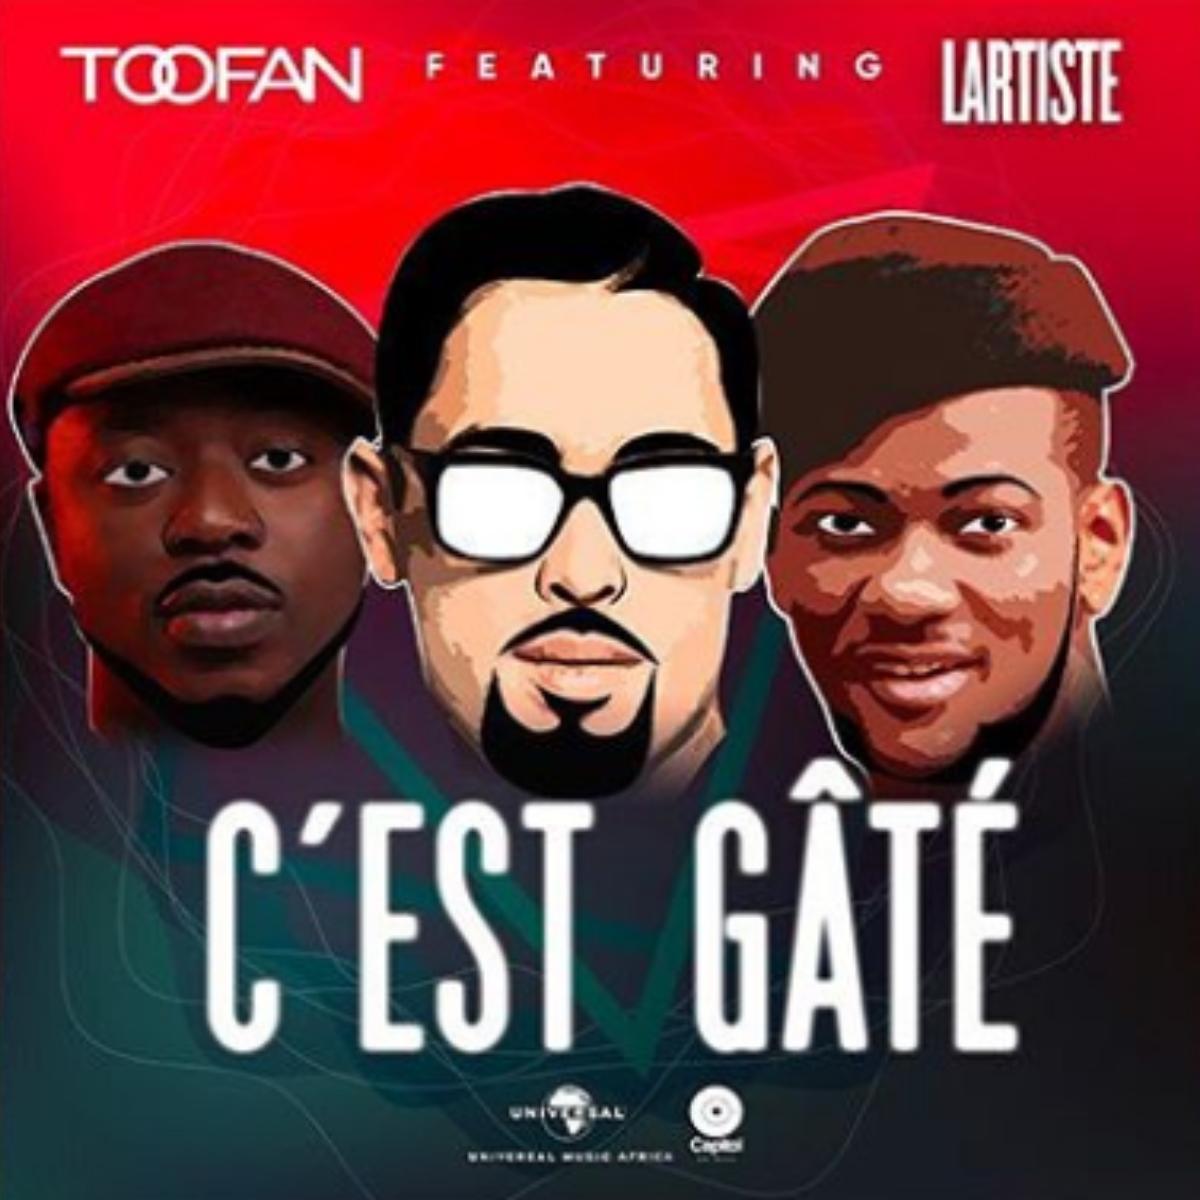 Toofan - C'est Gâté feat. Lartiste